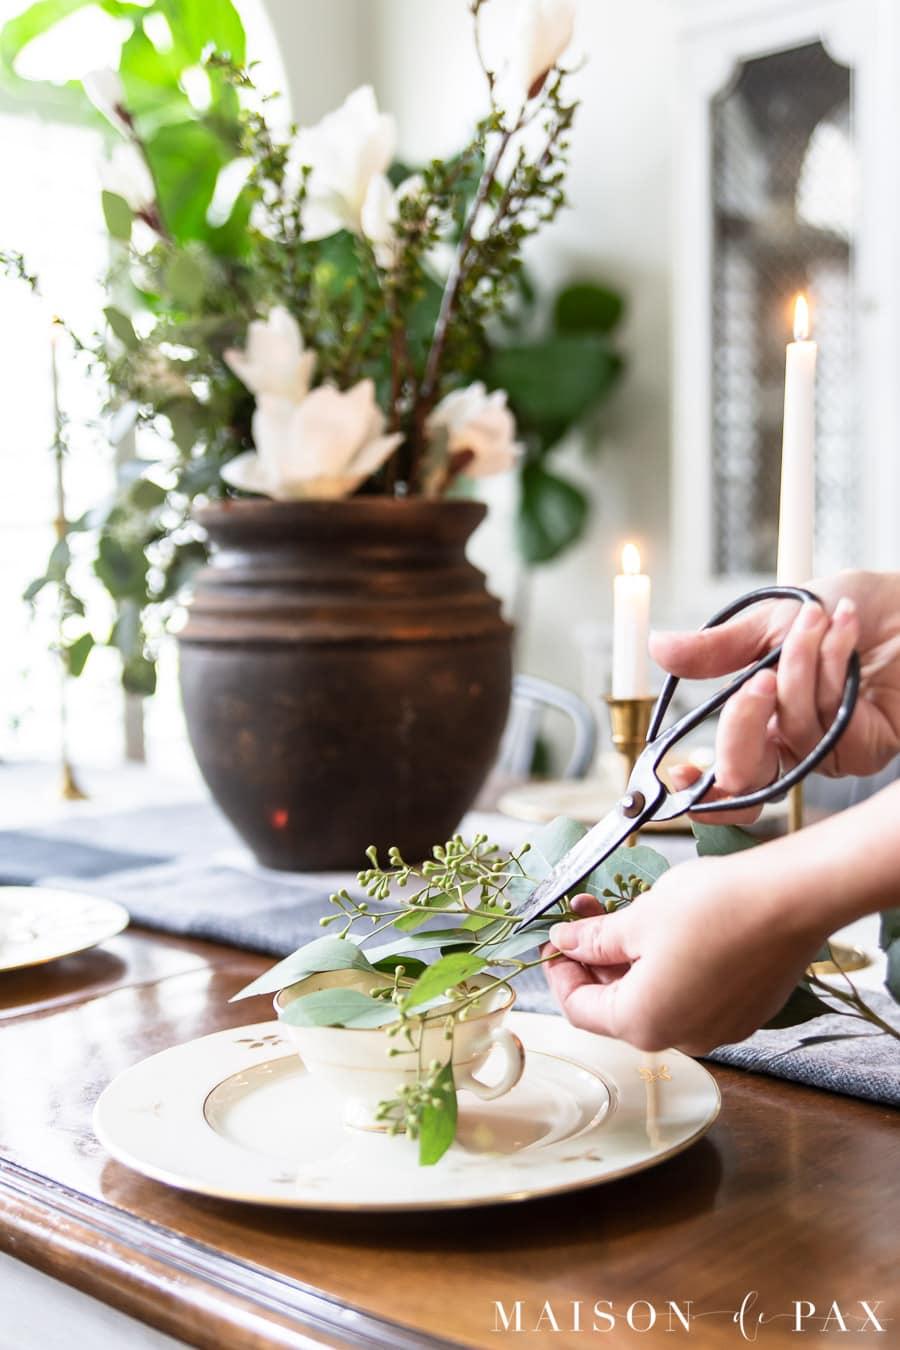 cutting eucalyptus clippings for teacups on plates | Maison de Pax